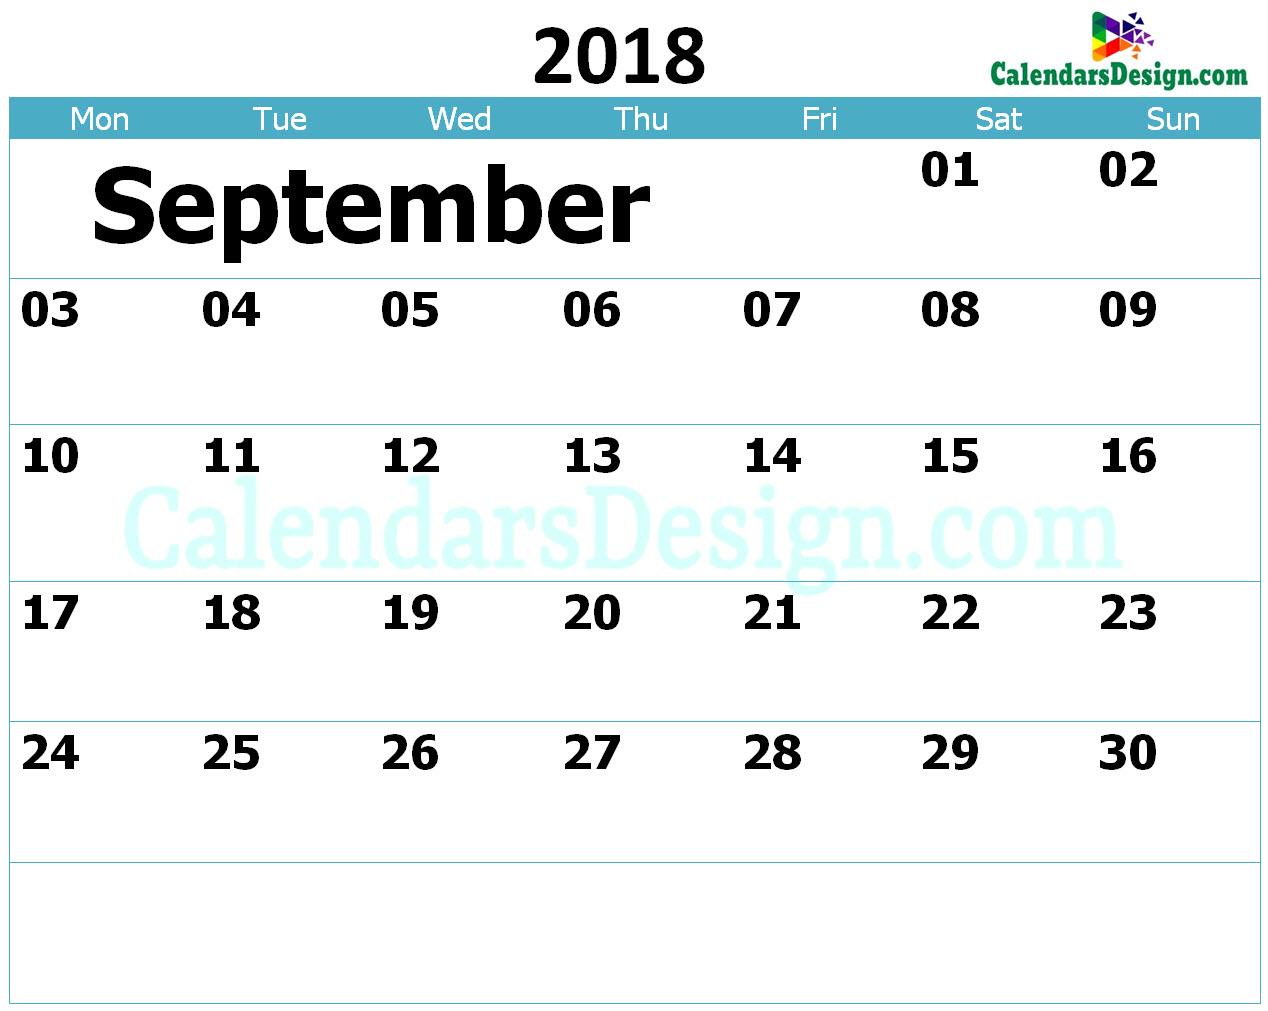 Printable Calendar for September 2018 Templates